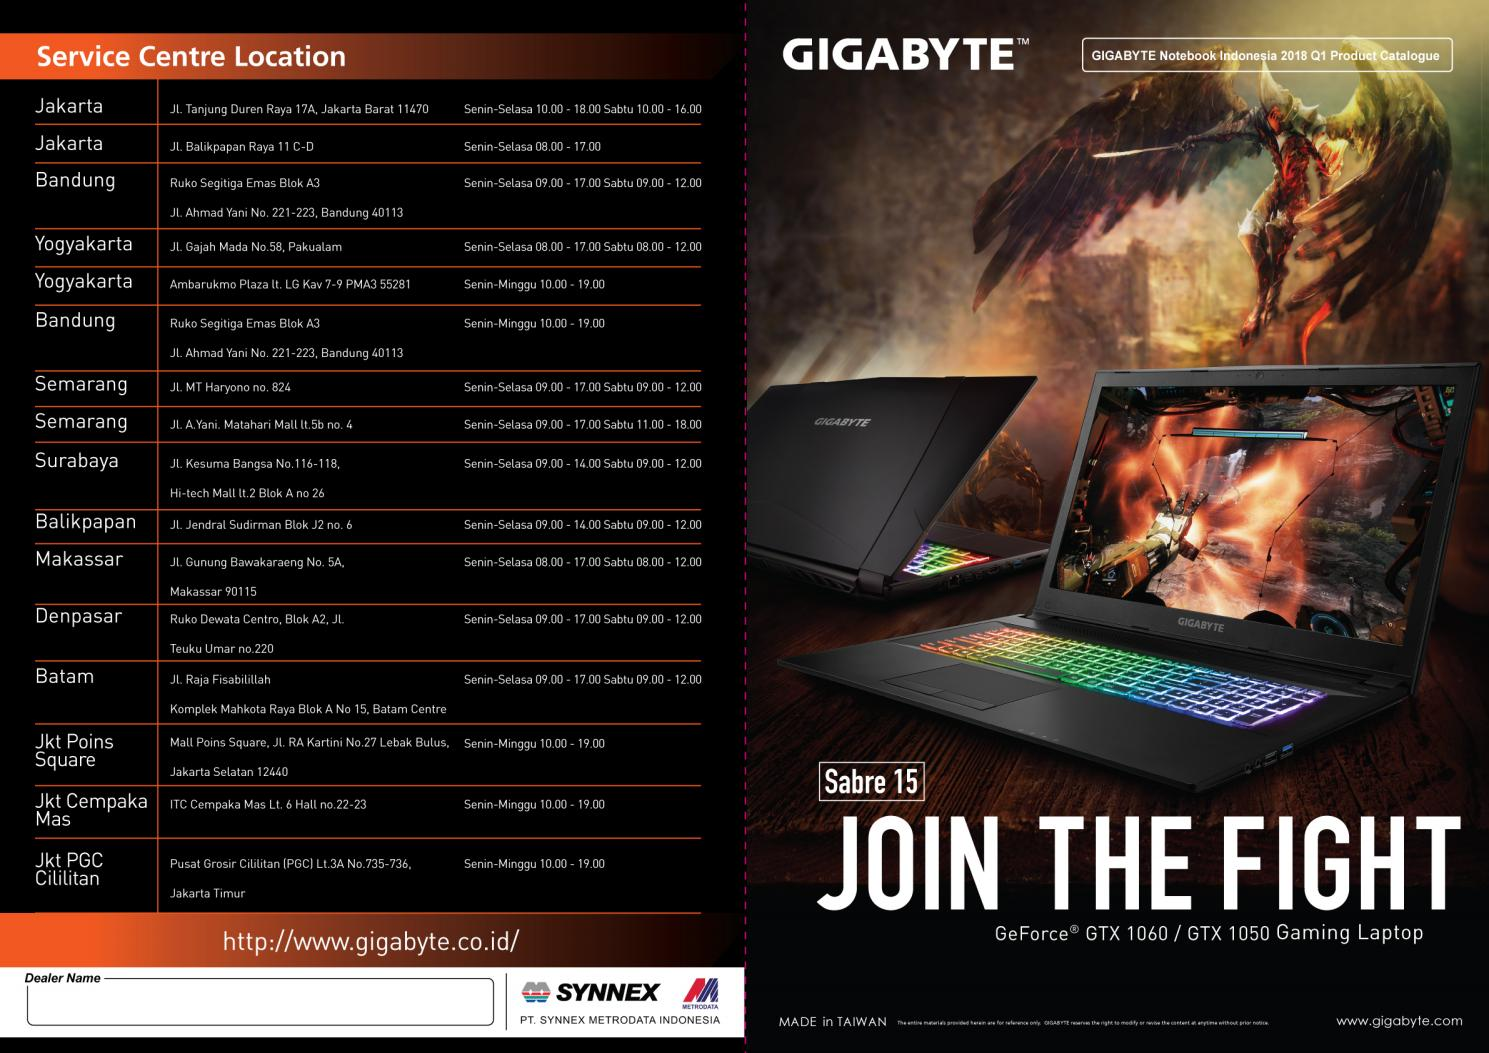 2018 gigabyte notebook indonesia q1 catalogue by GIGABYTE